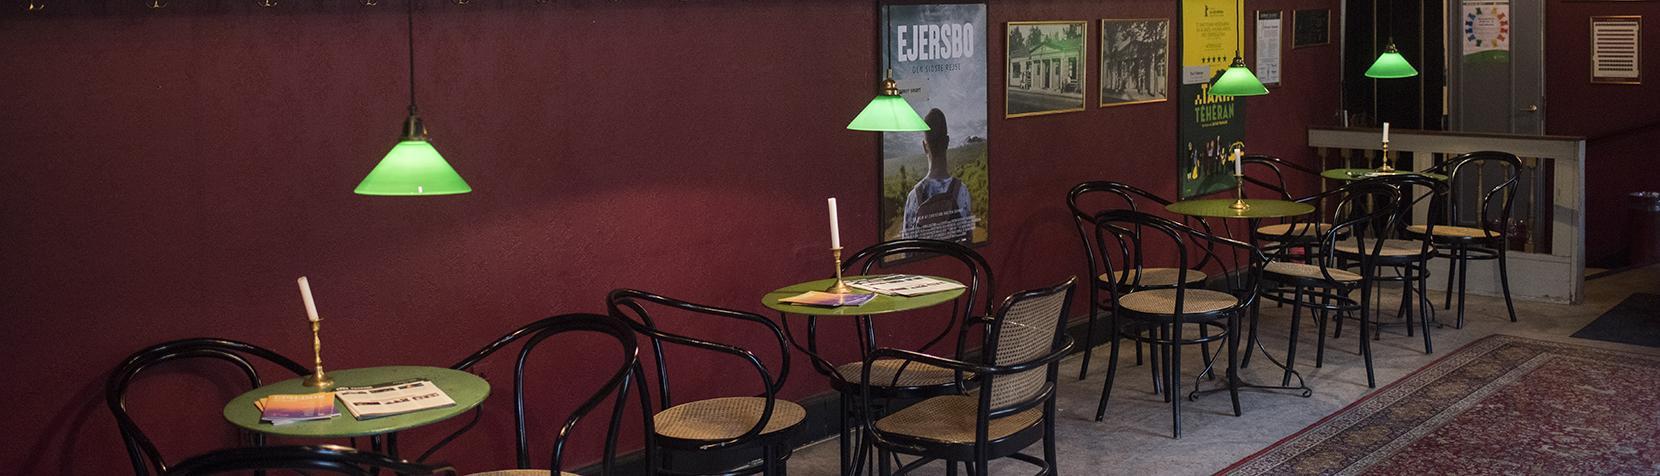 Reprisen - caféen